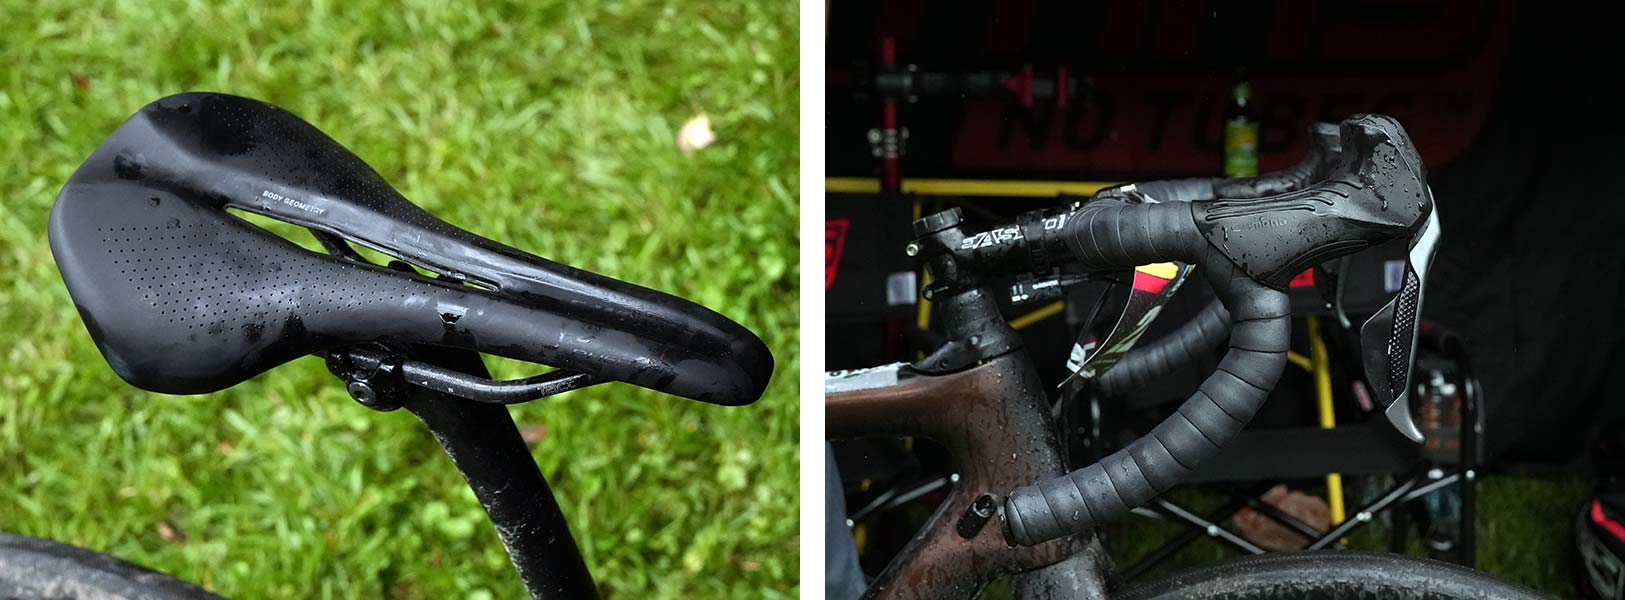 cockpit details of CLIF Pro Team gravel race bike for russell finsterwald